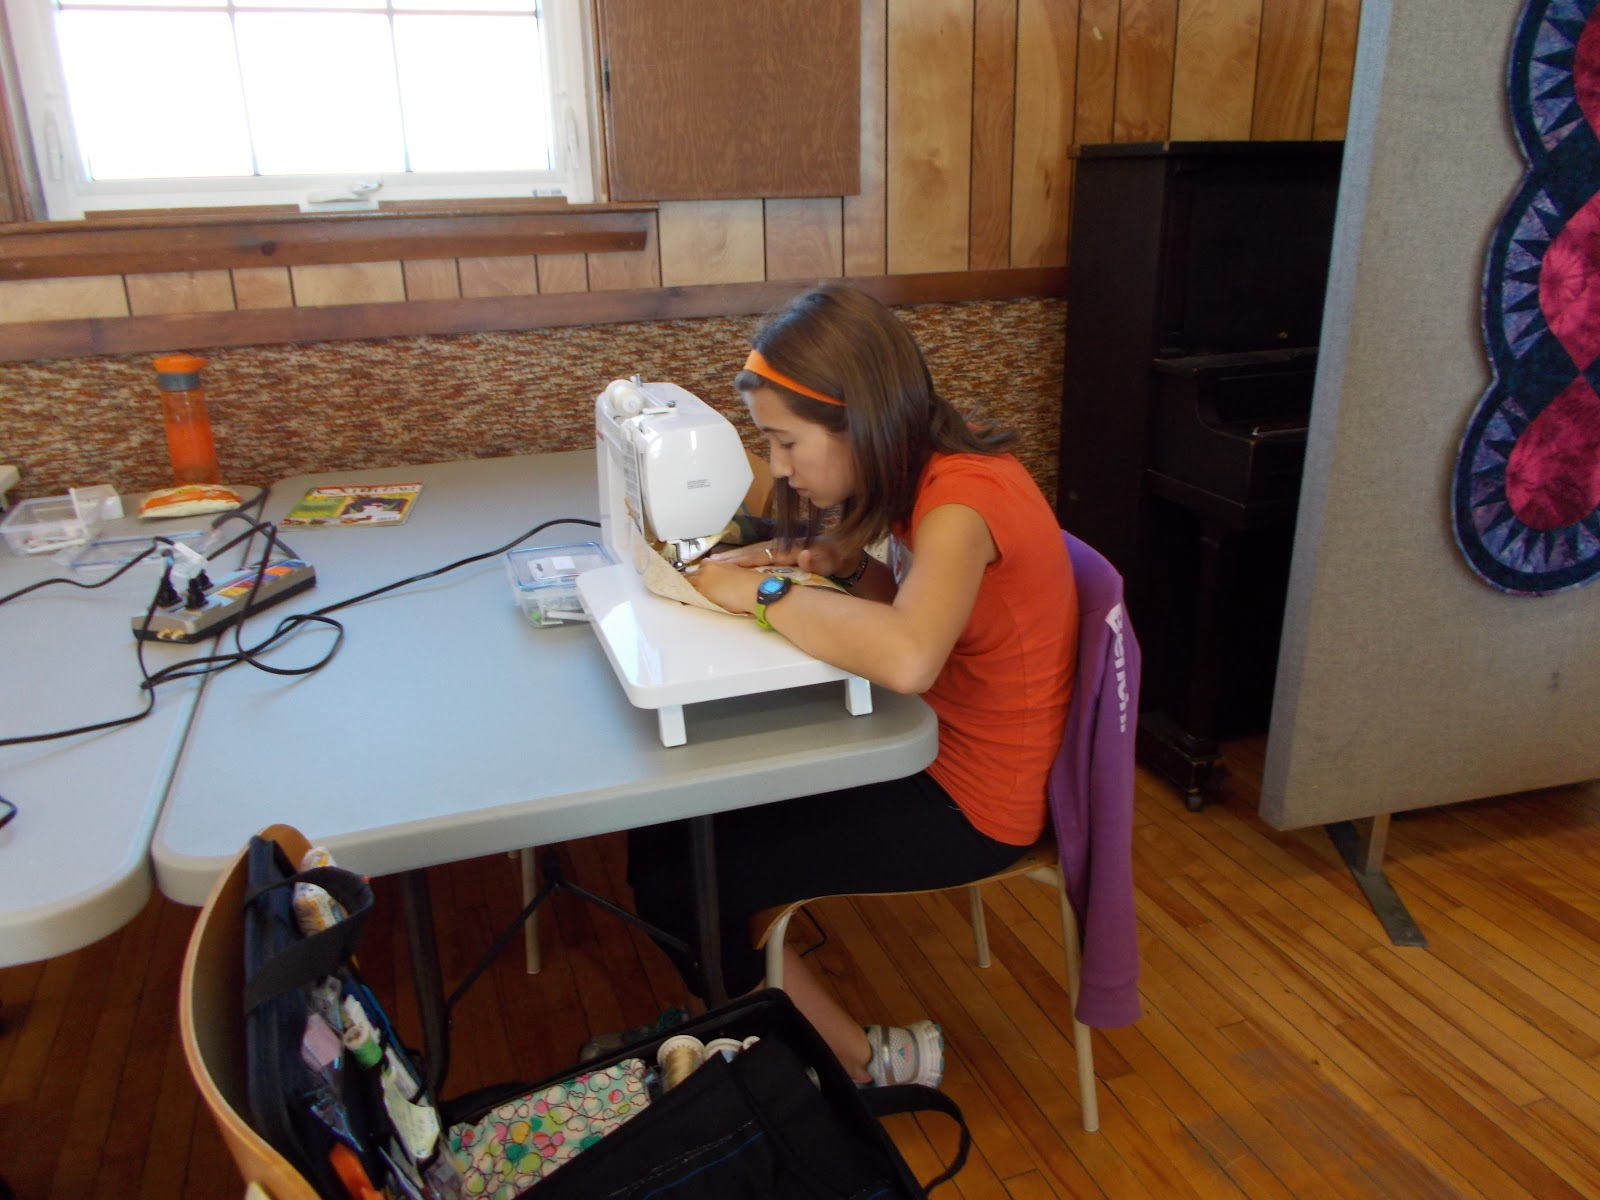 Ouvrages dune Acadienne: Grand-daughter Laurene inspires me